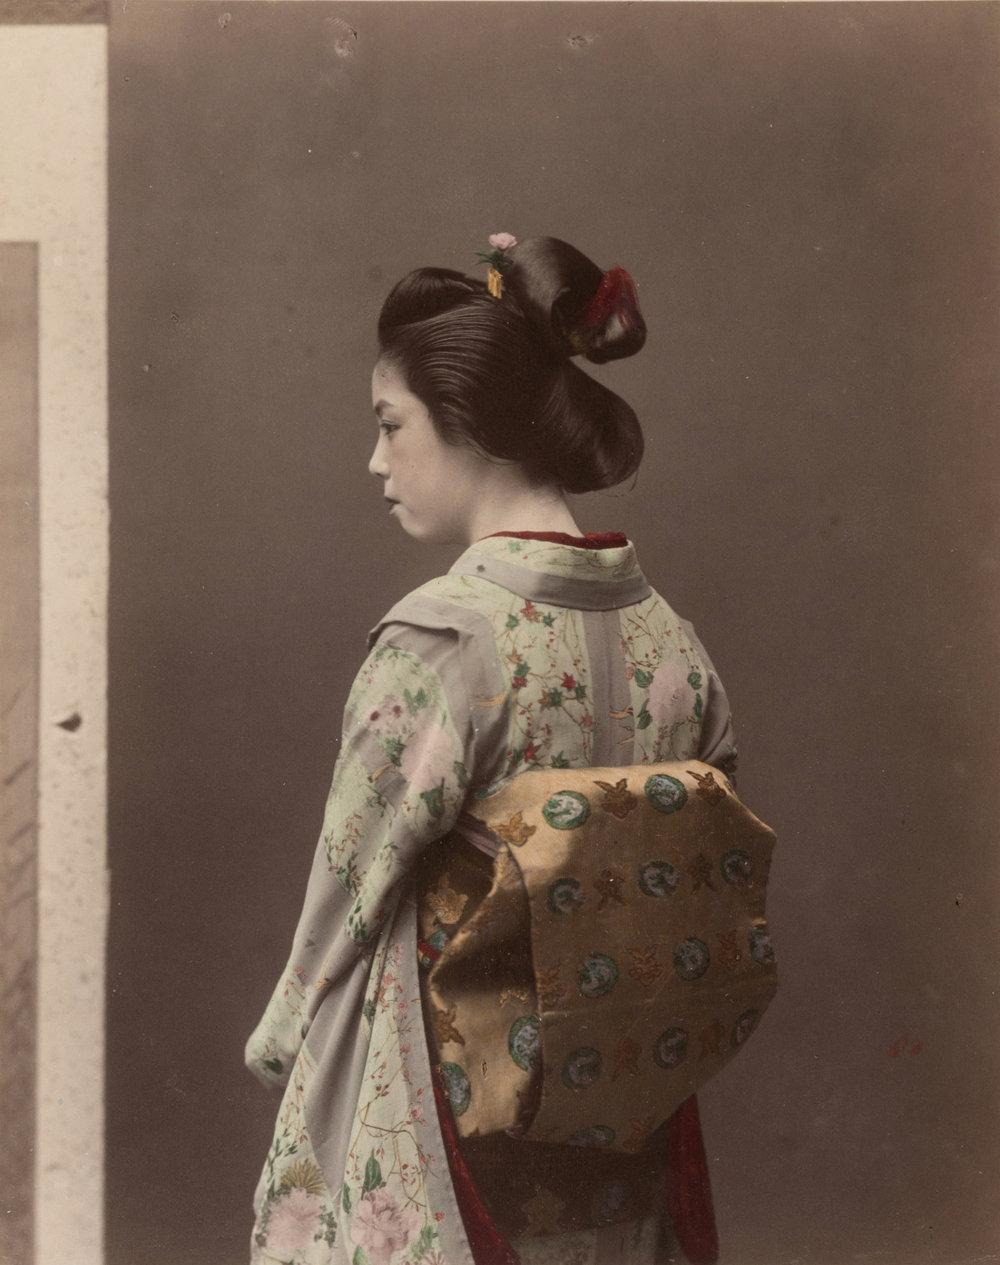 Une geïko, par Tamamura Kozaburo.